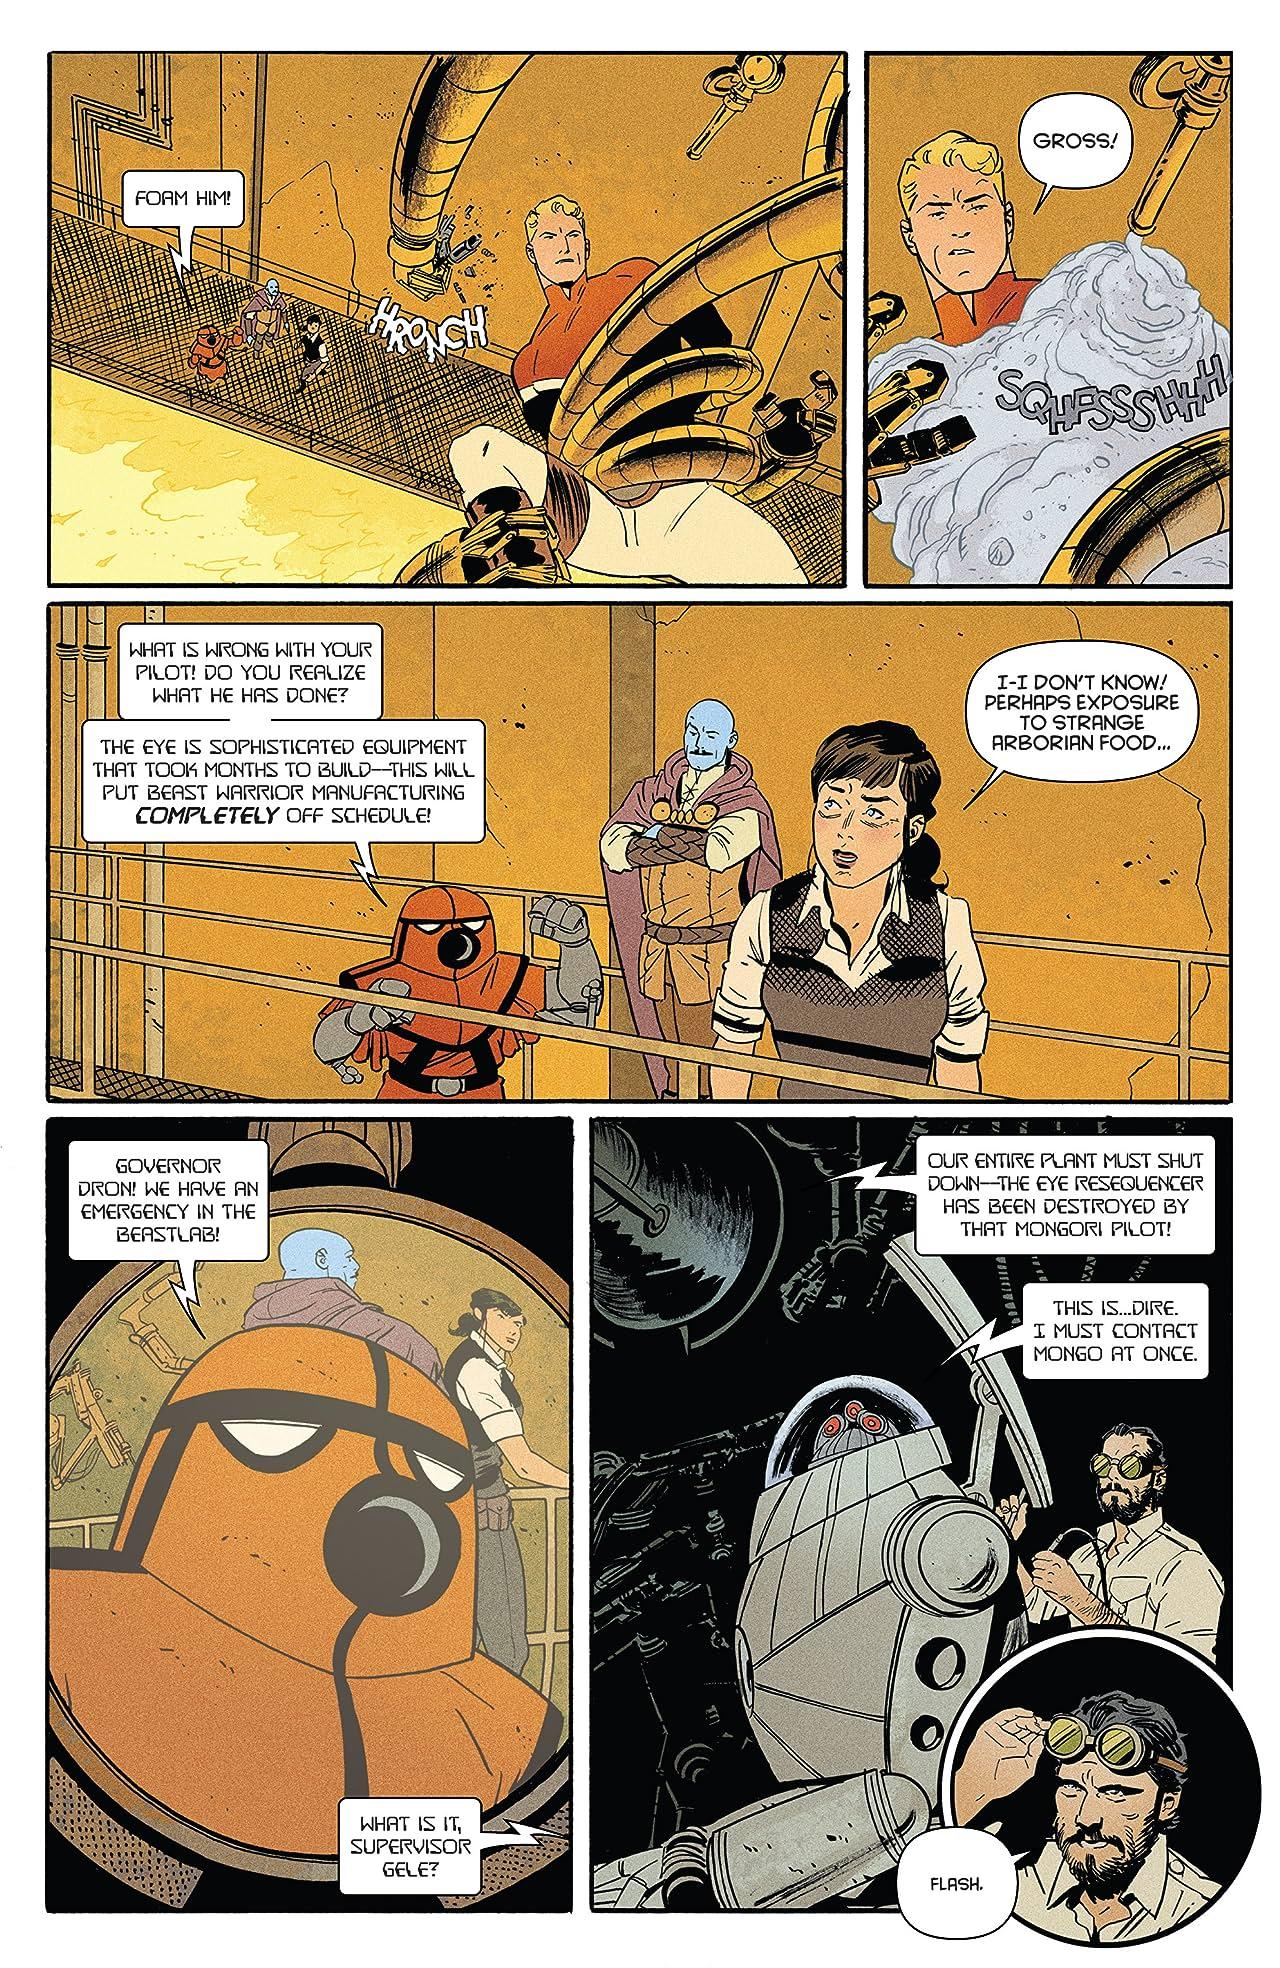 Flash Gordon #3: Digital Exclusive Edition